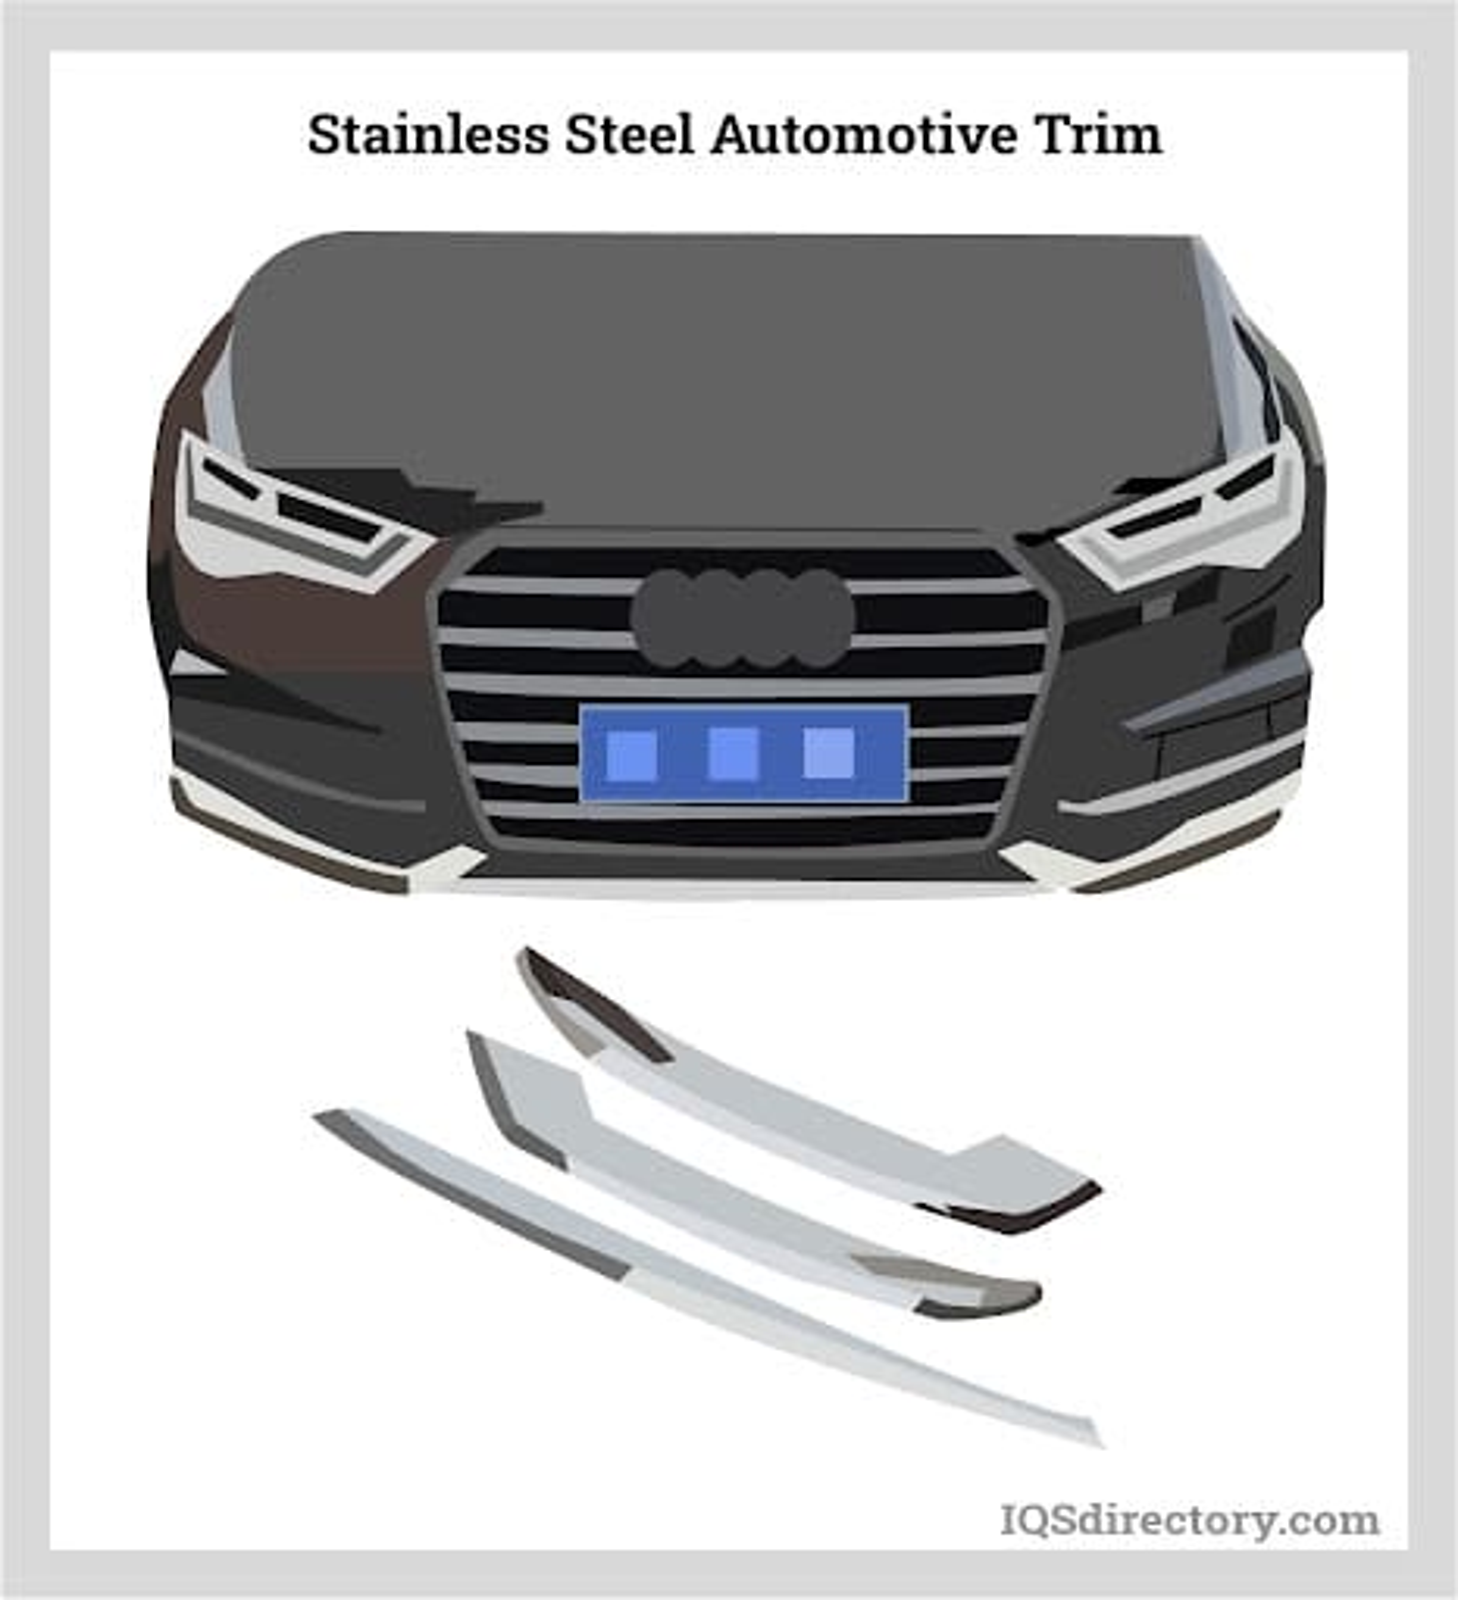 Stainless Steel Automotive Trim